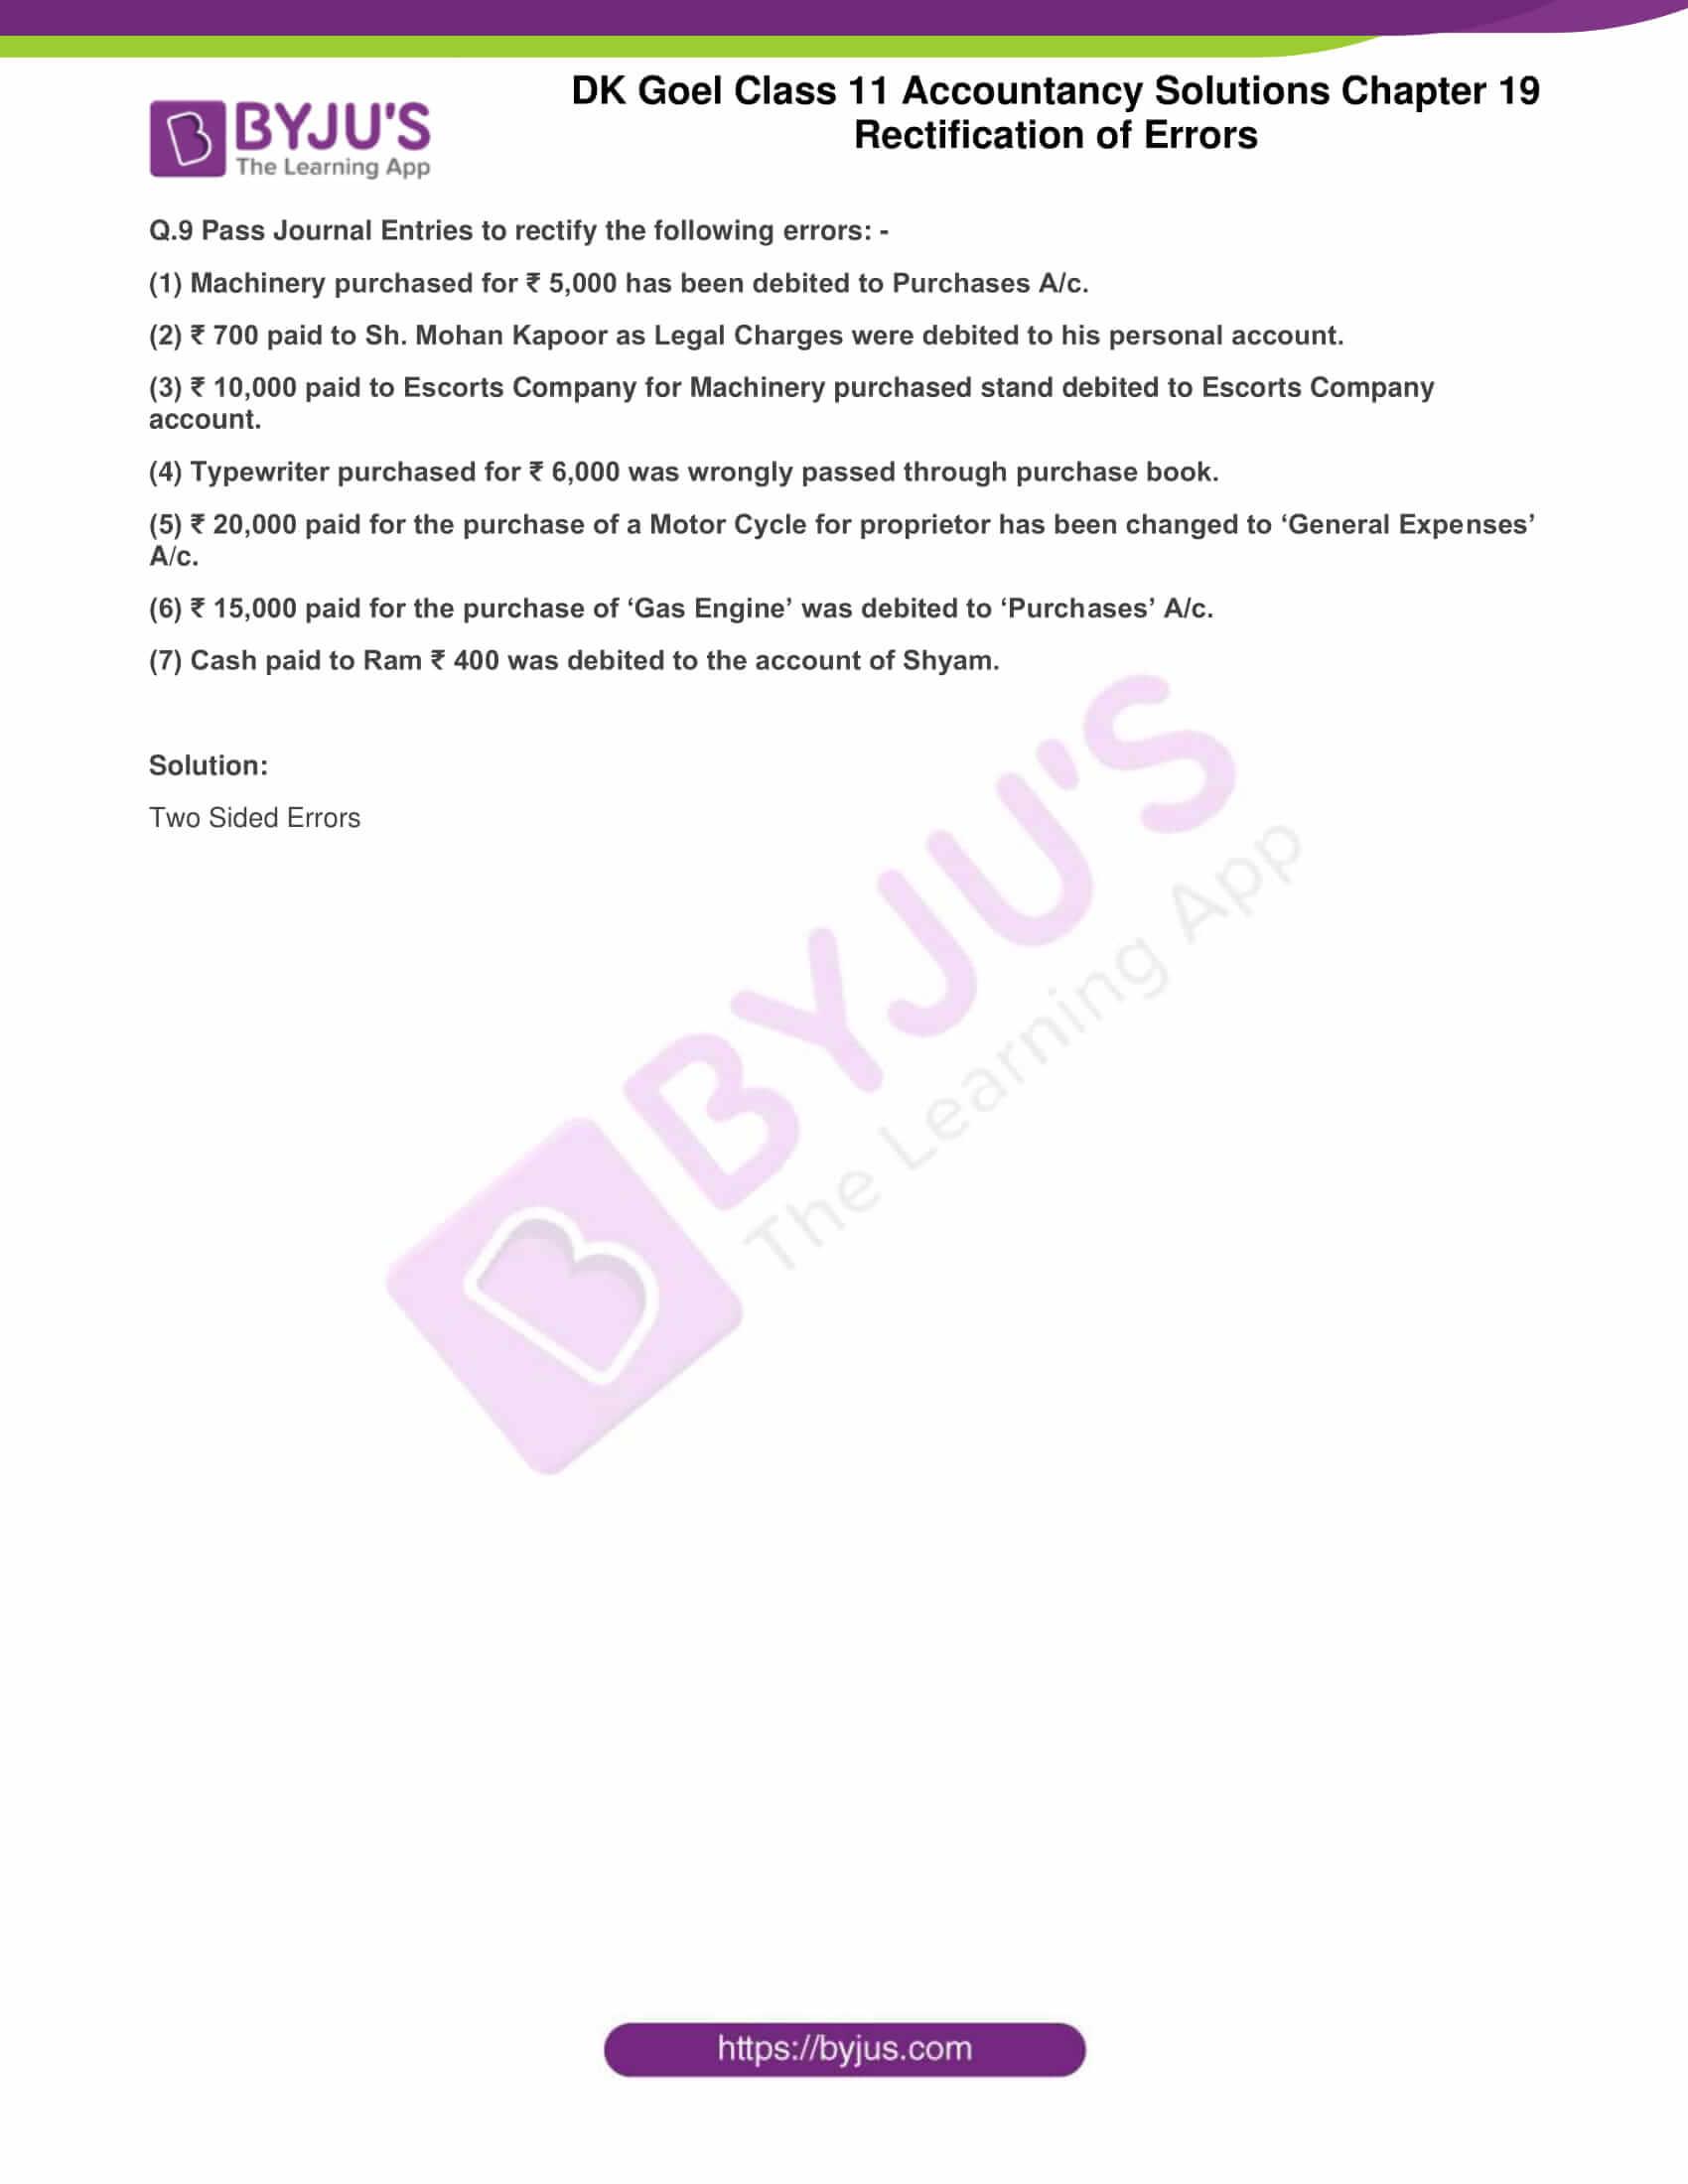 dk goel solutions class 11 accountancy chapter 19 rectification 14